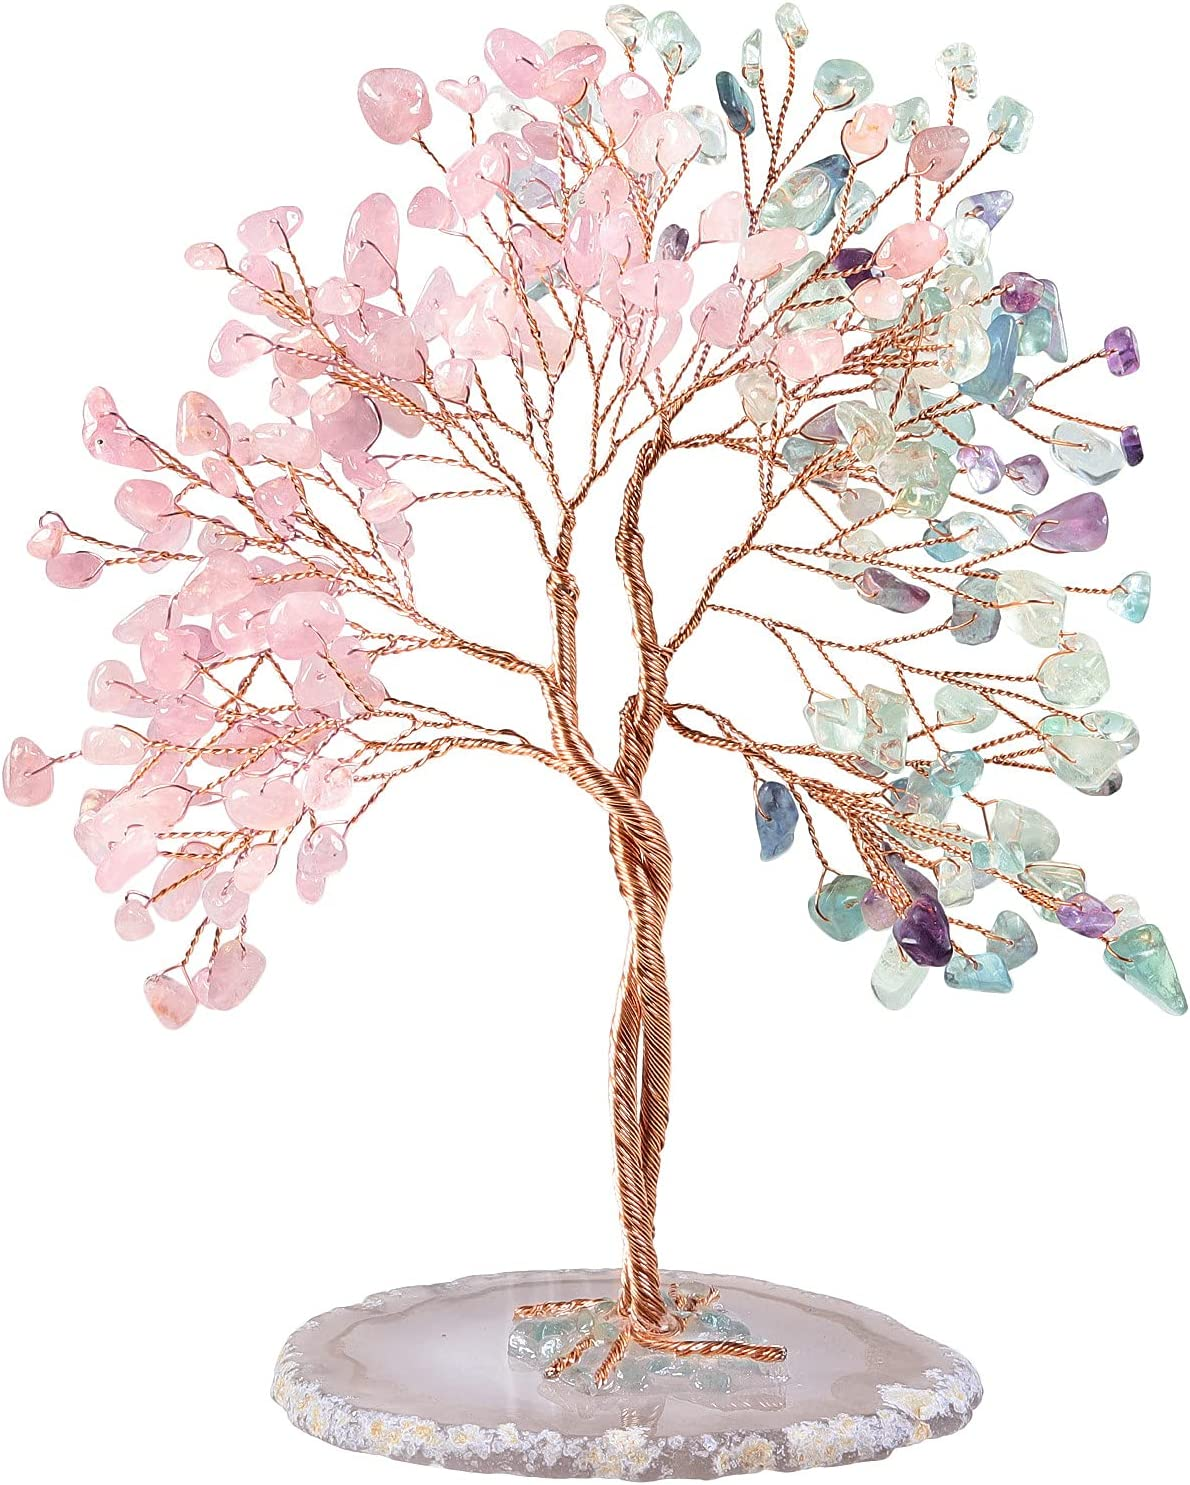 mookaitedecor Handmade Rose Quartz Choice Crystal Cheap sale Tree Fluorite with